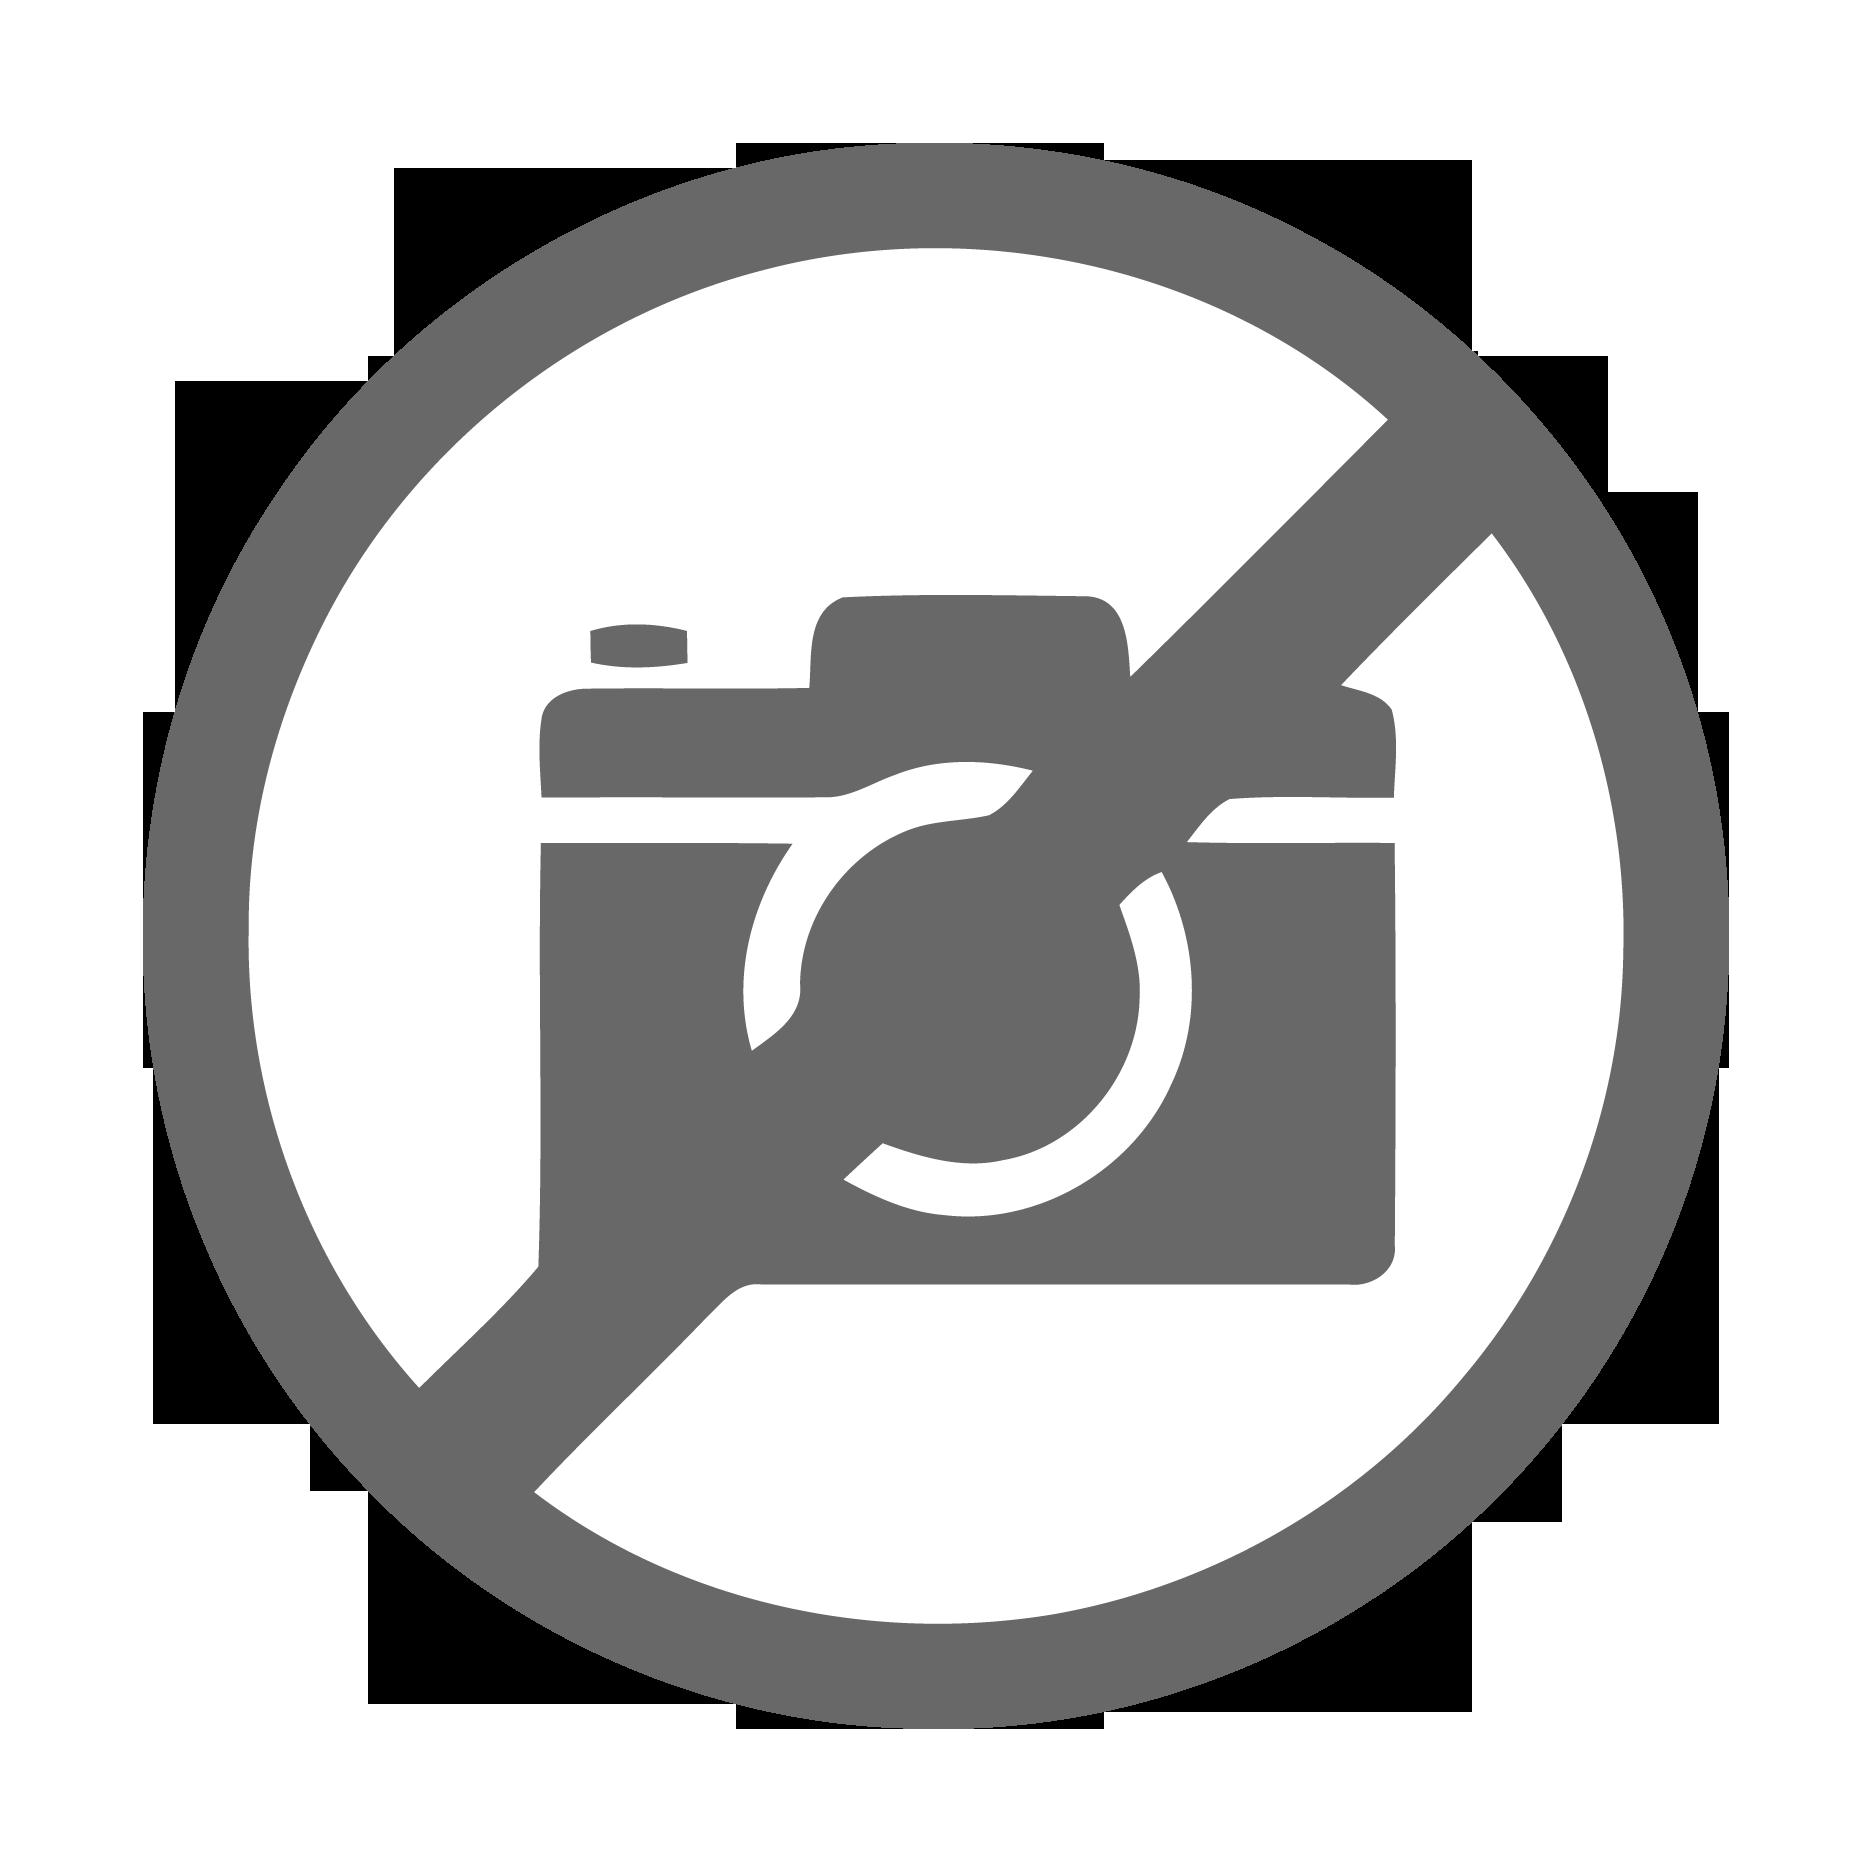 Fast Food MoJo